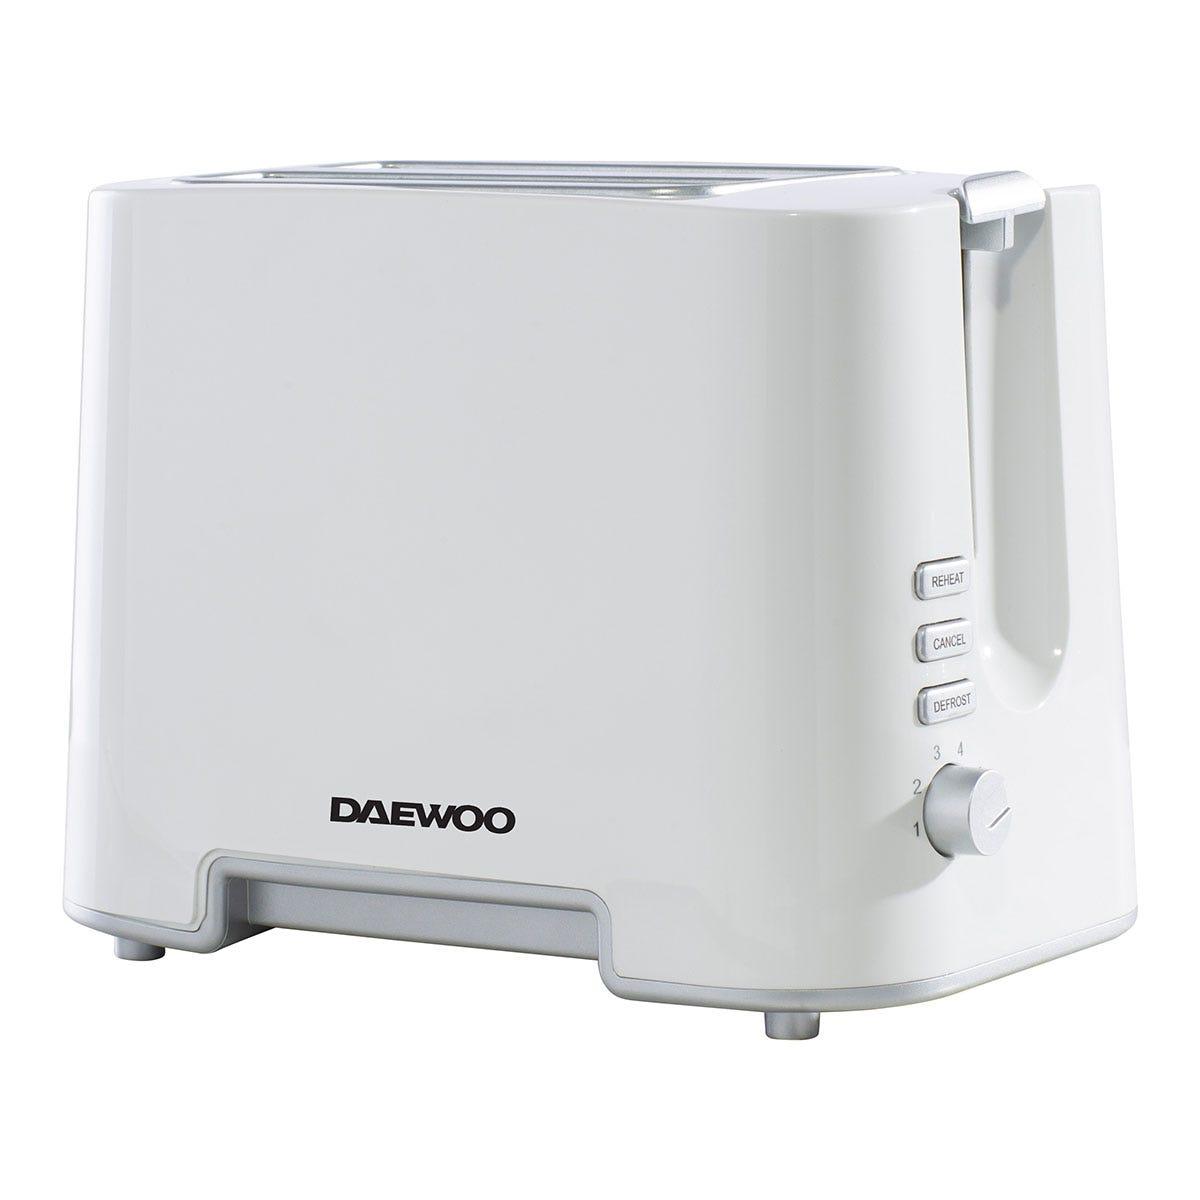 Daewoo SDA1651 870W 2-Slice Plastic Toaster - White with Chrome Band